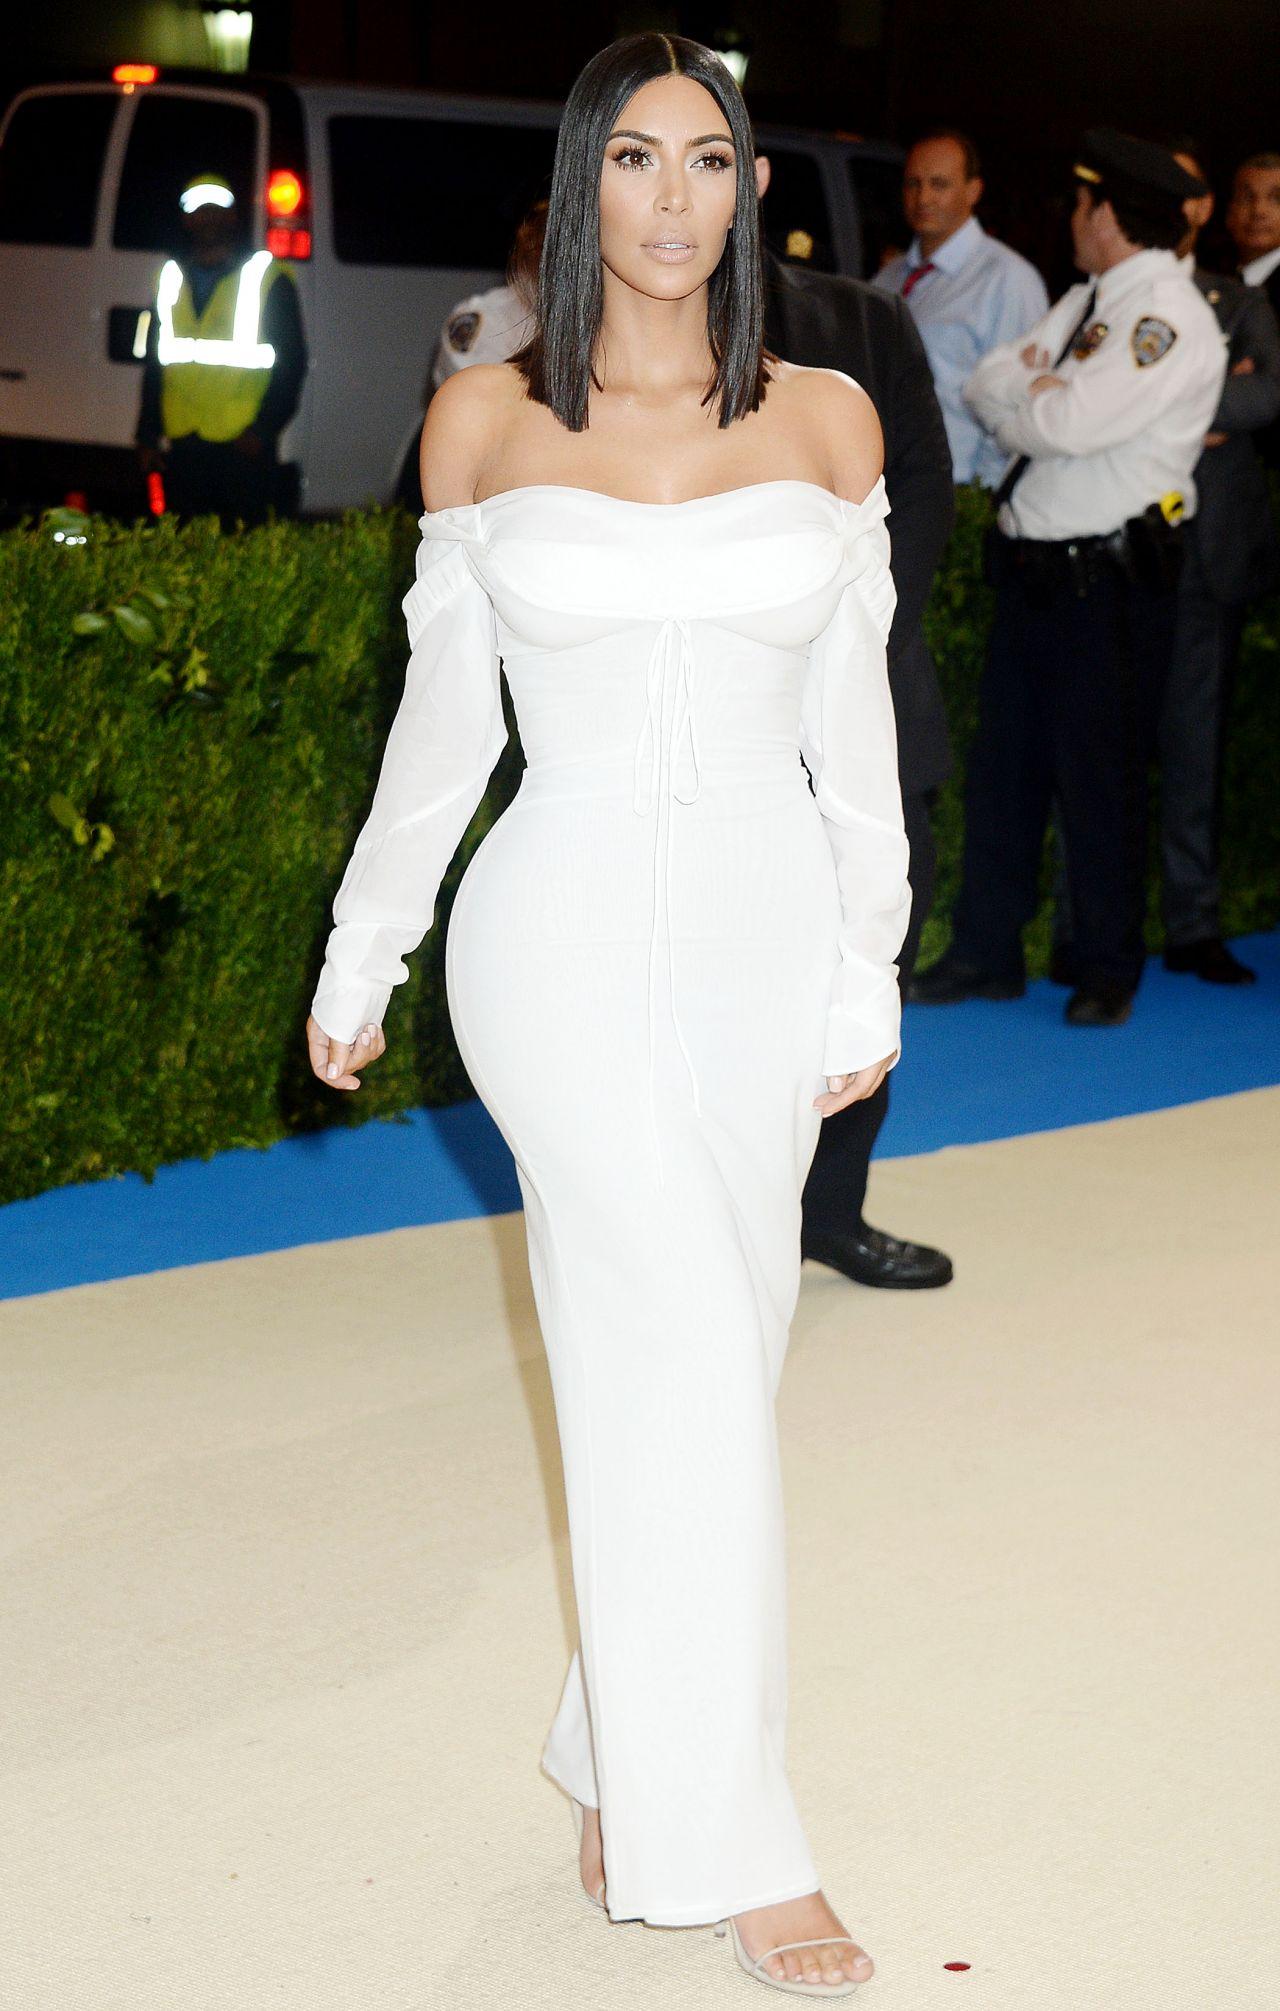 Kim Kardashian at MET Gala in New York 05/01/2017 Kim Kardashian